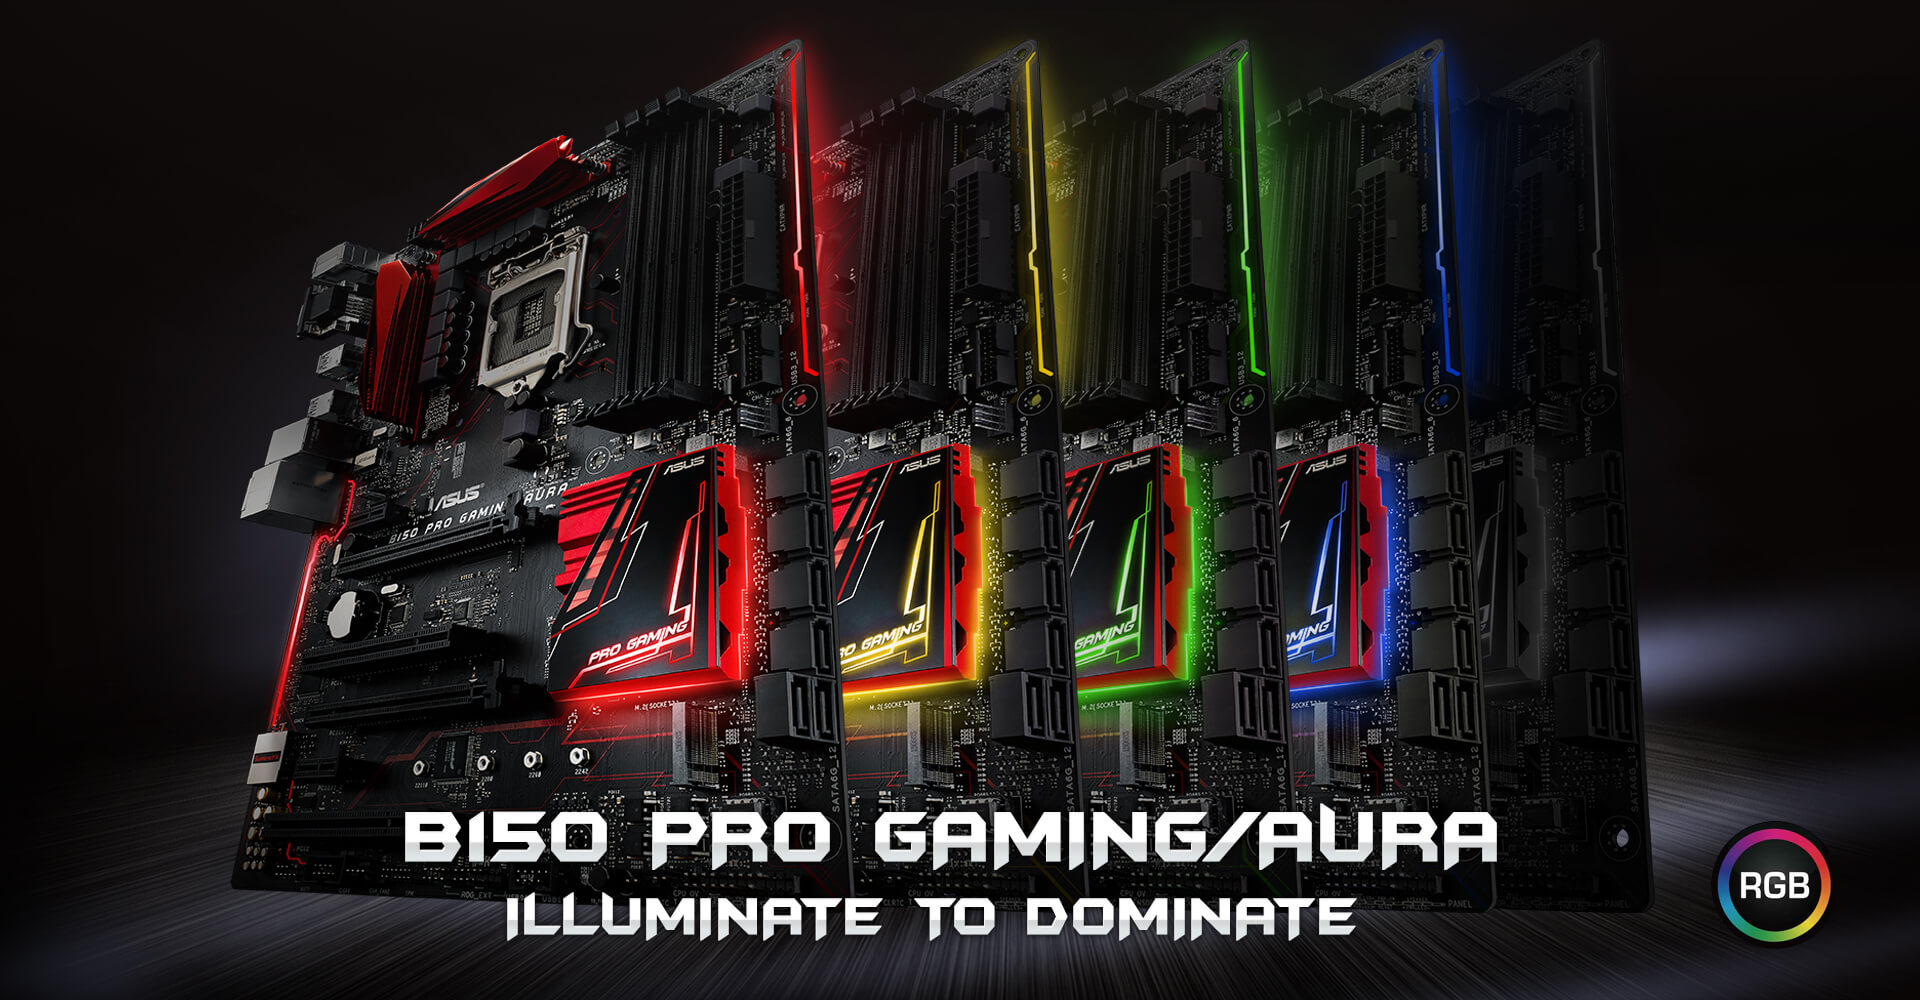 B150 PRO GAMING/AURA   Motherboards   ASUS USA